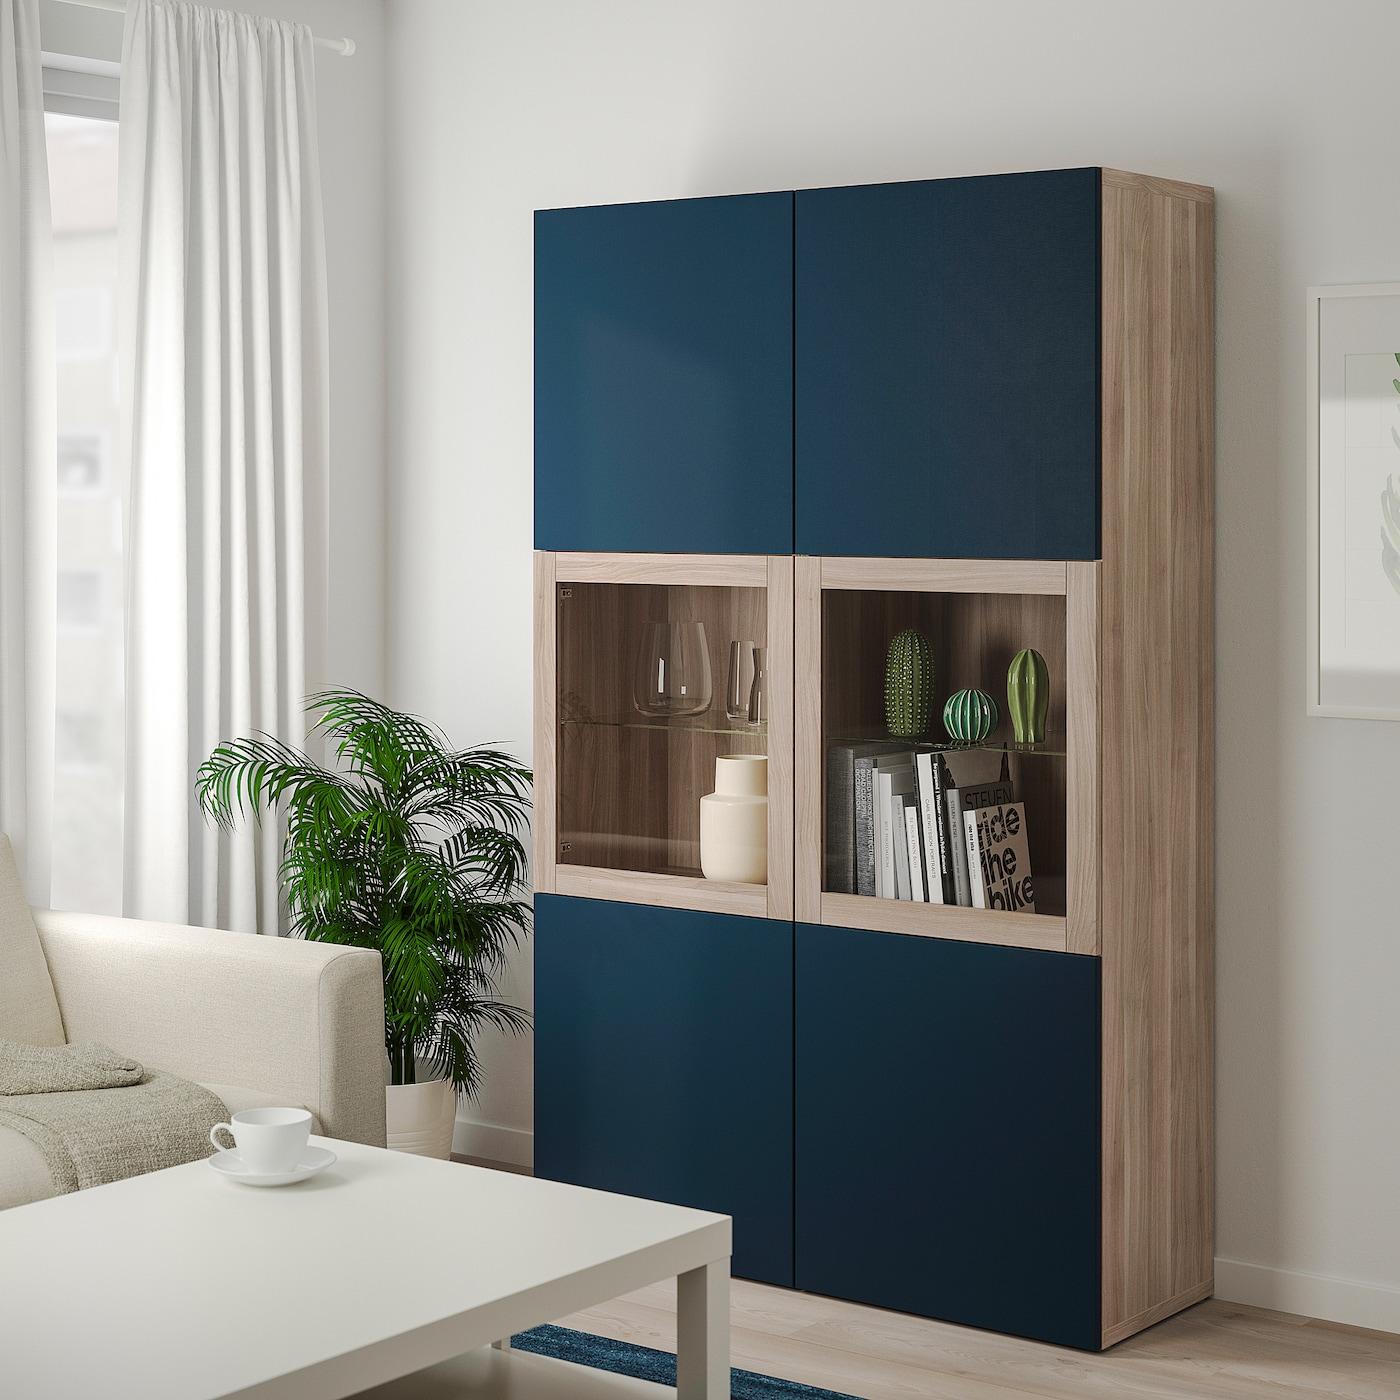 Besta Storage Combination W Glass Doors Grey Stained Walnut Effect Notviken Blue Clear Glass Ikea